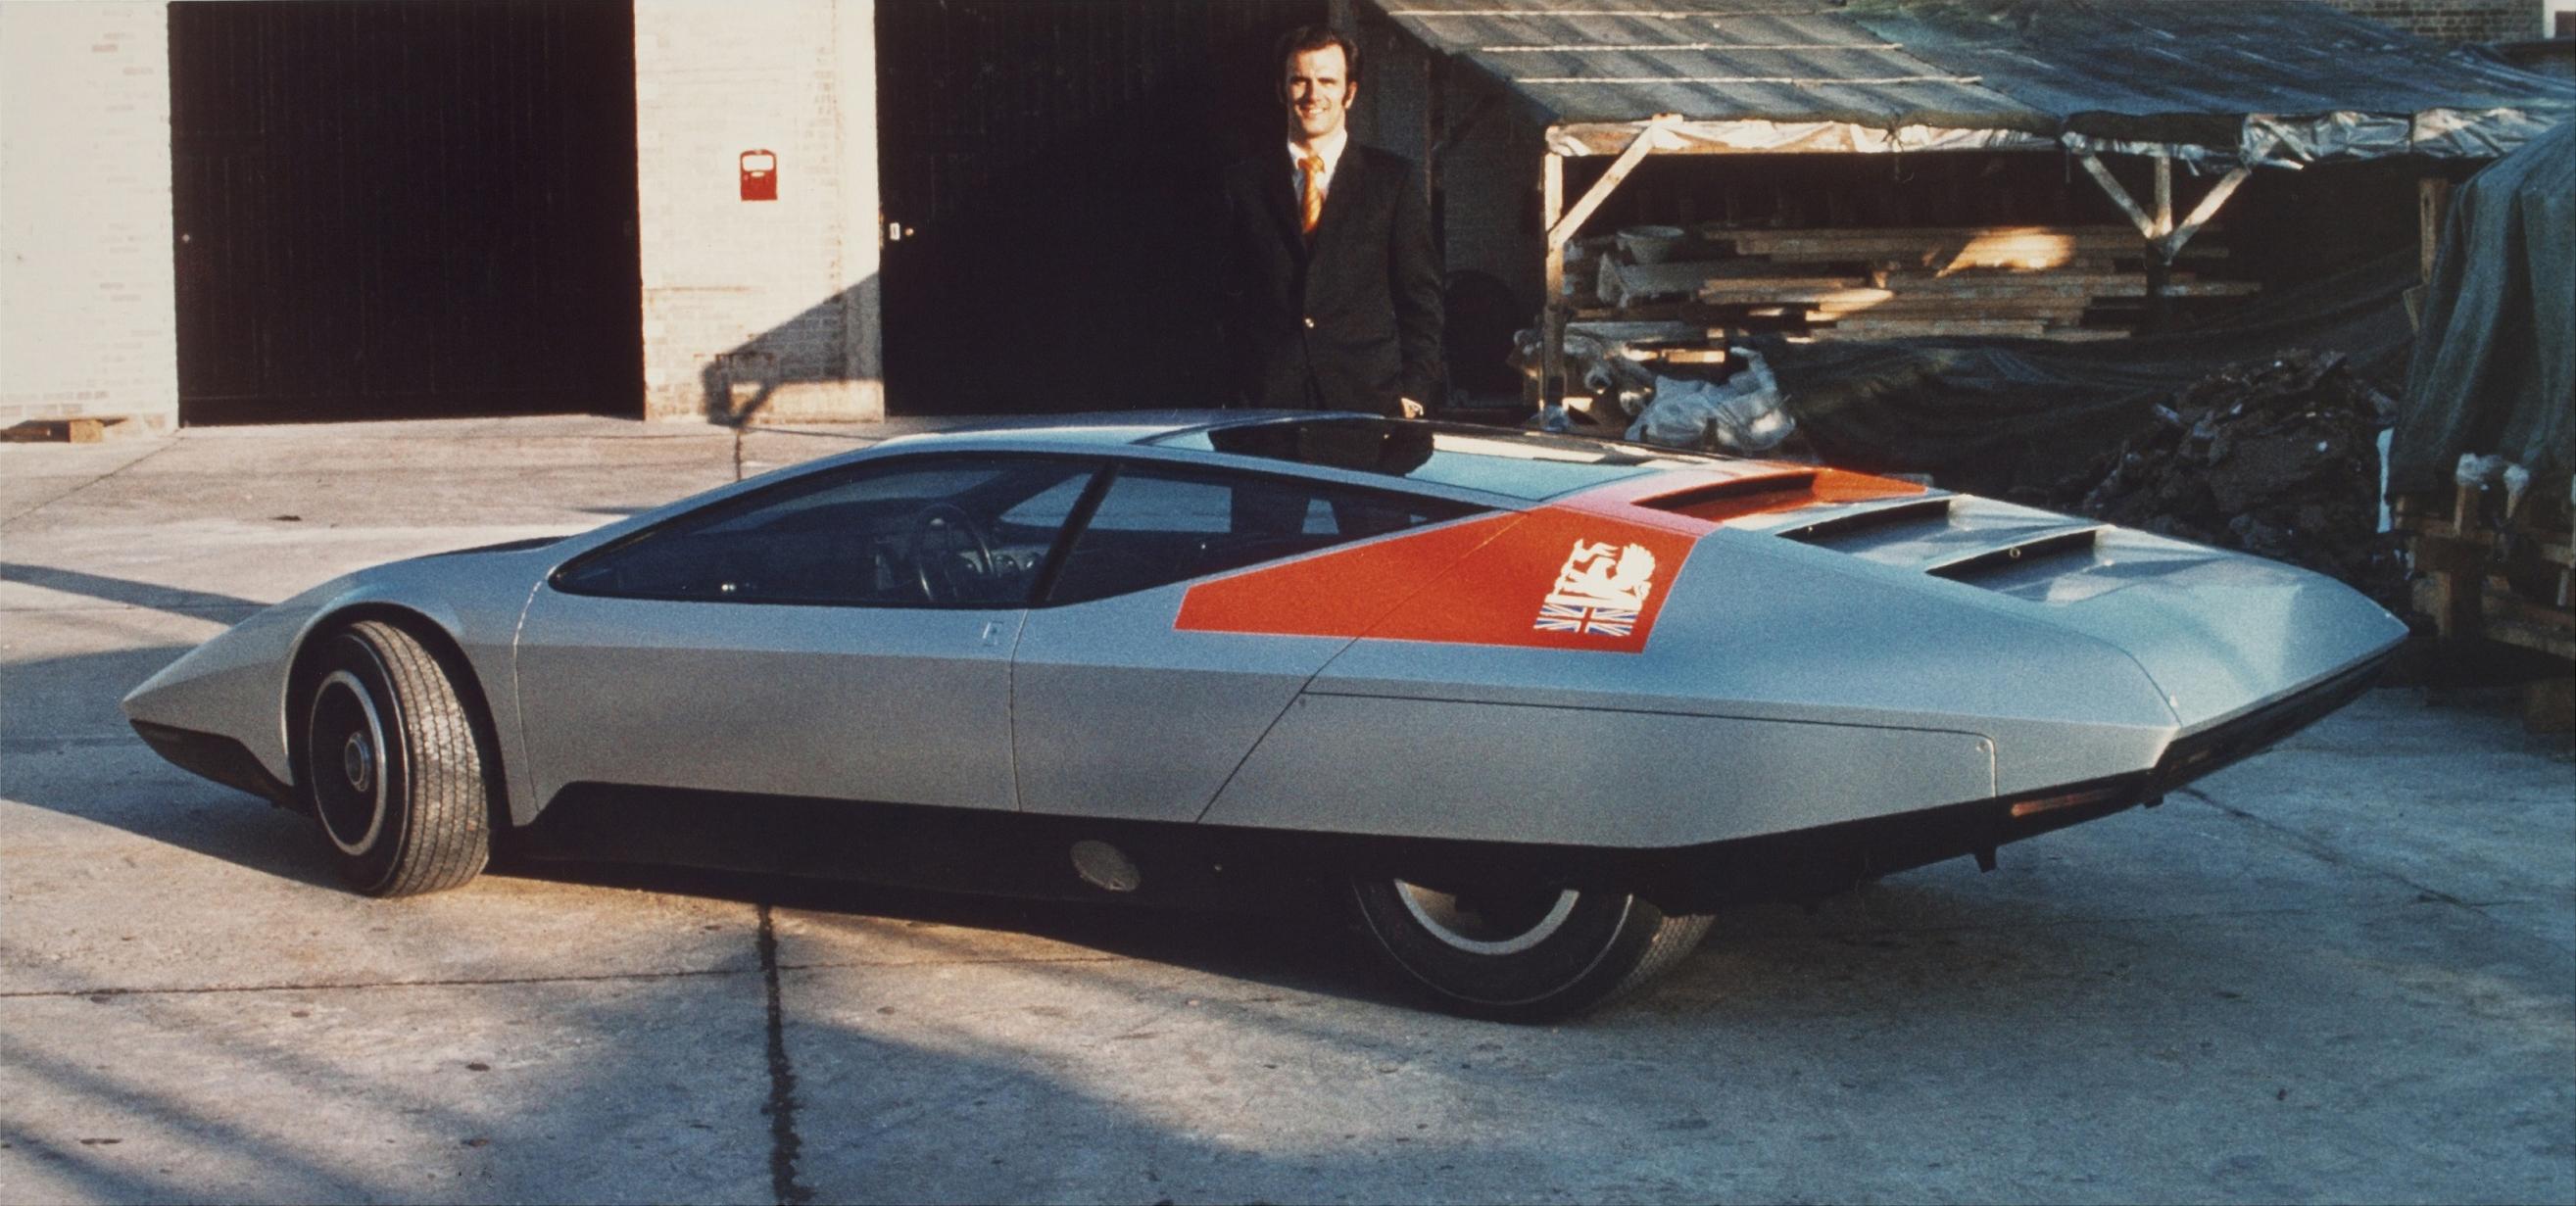 1970 Vauxhall Srv Concepts